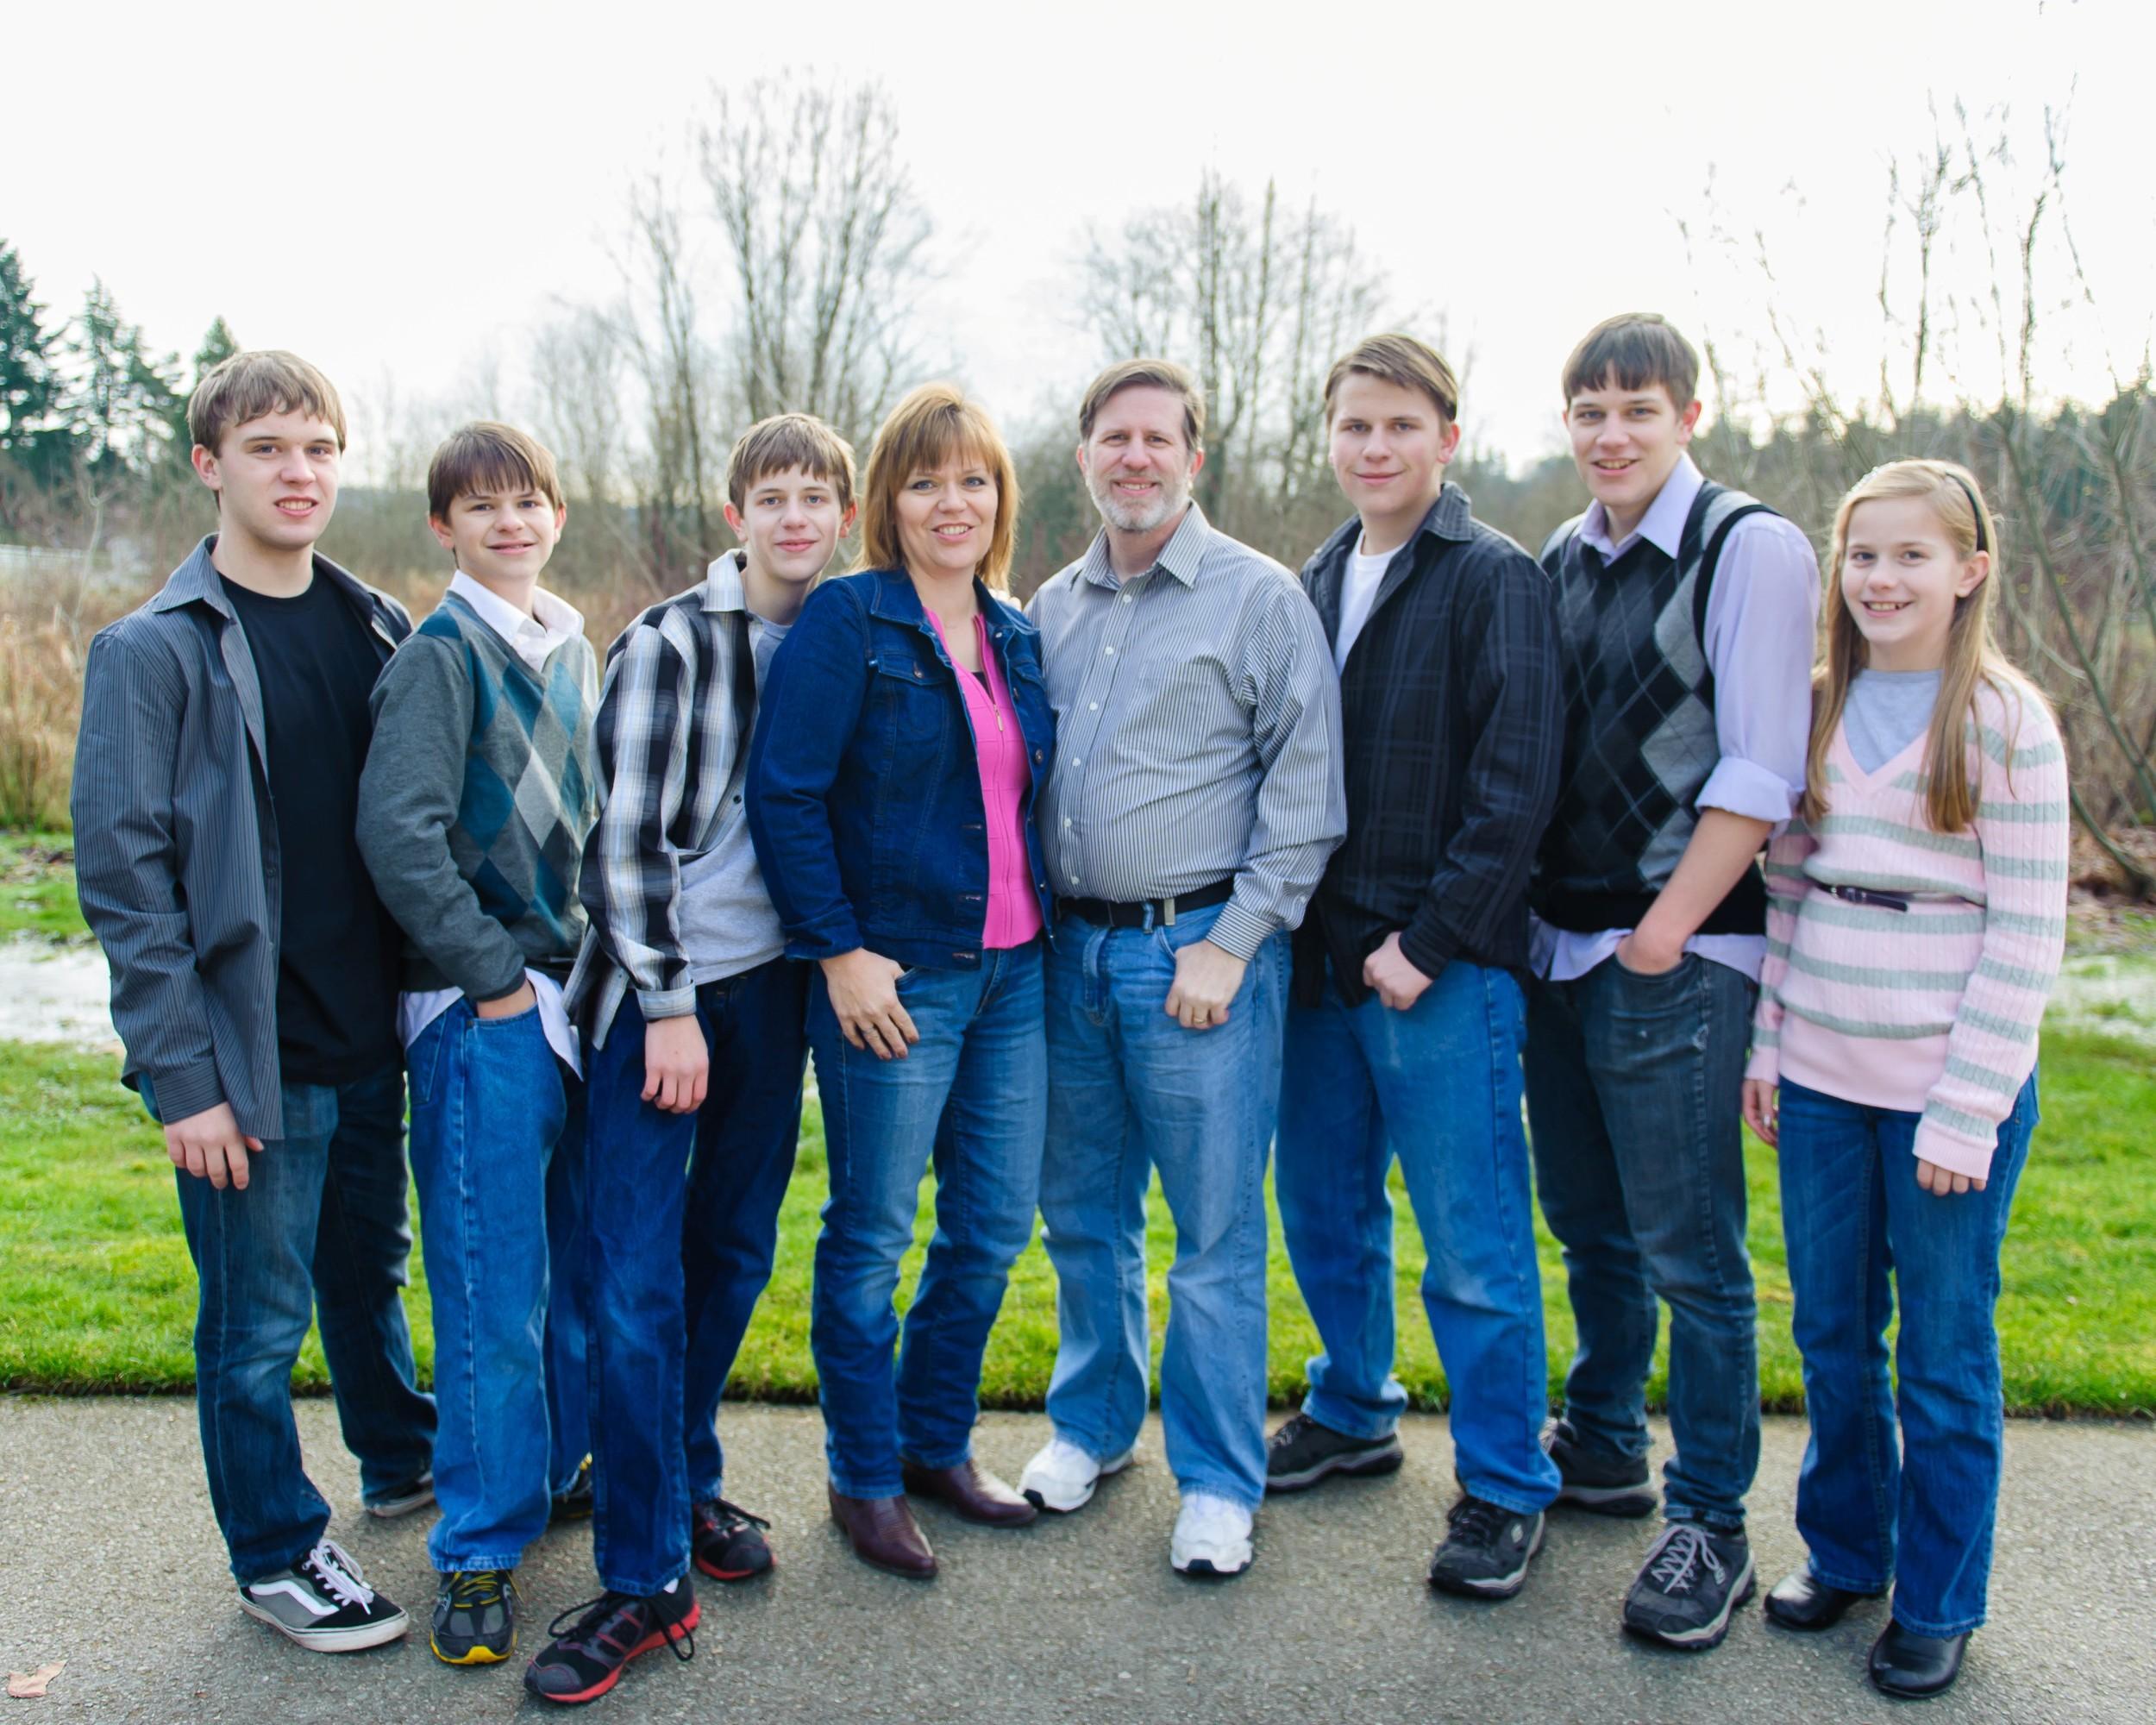 2013 Jan, Family Photo, Jason, Matt, Chris, Doreen, Steve, Mike, Kray & Jessie  size 10x8 (46).jpg